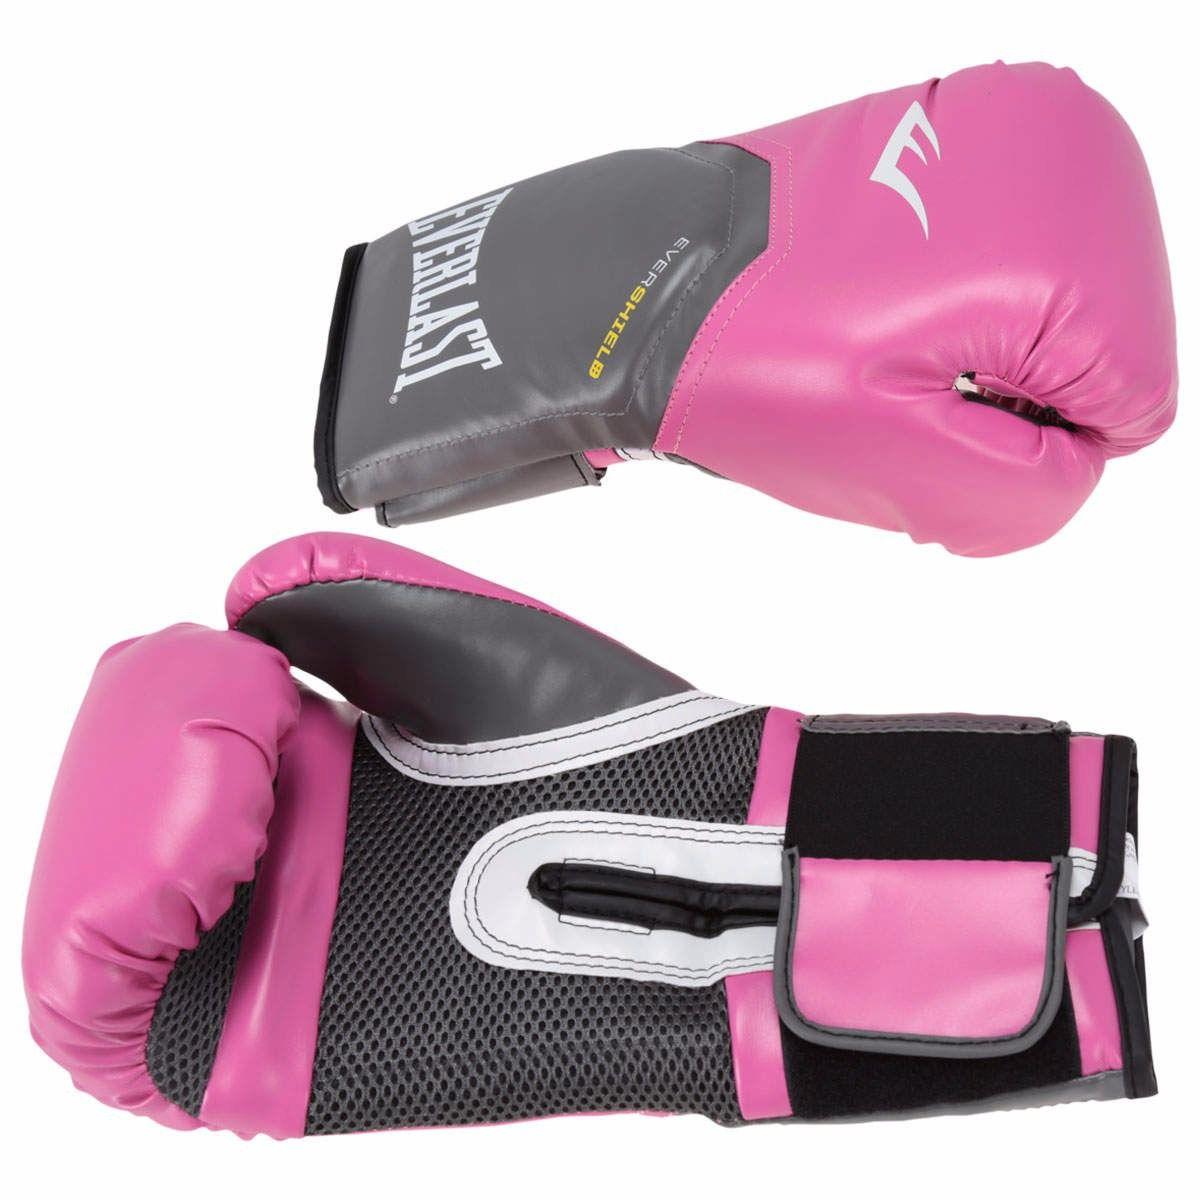 Luvas Boxe / Muay Thai - Elite  Evershield - Rosa - Everlast .  - Loja do Competidor